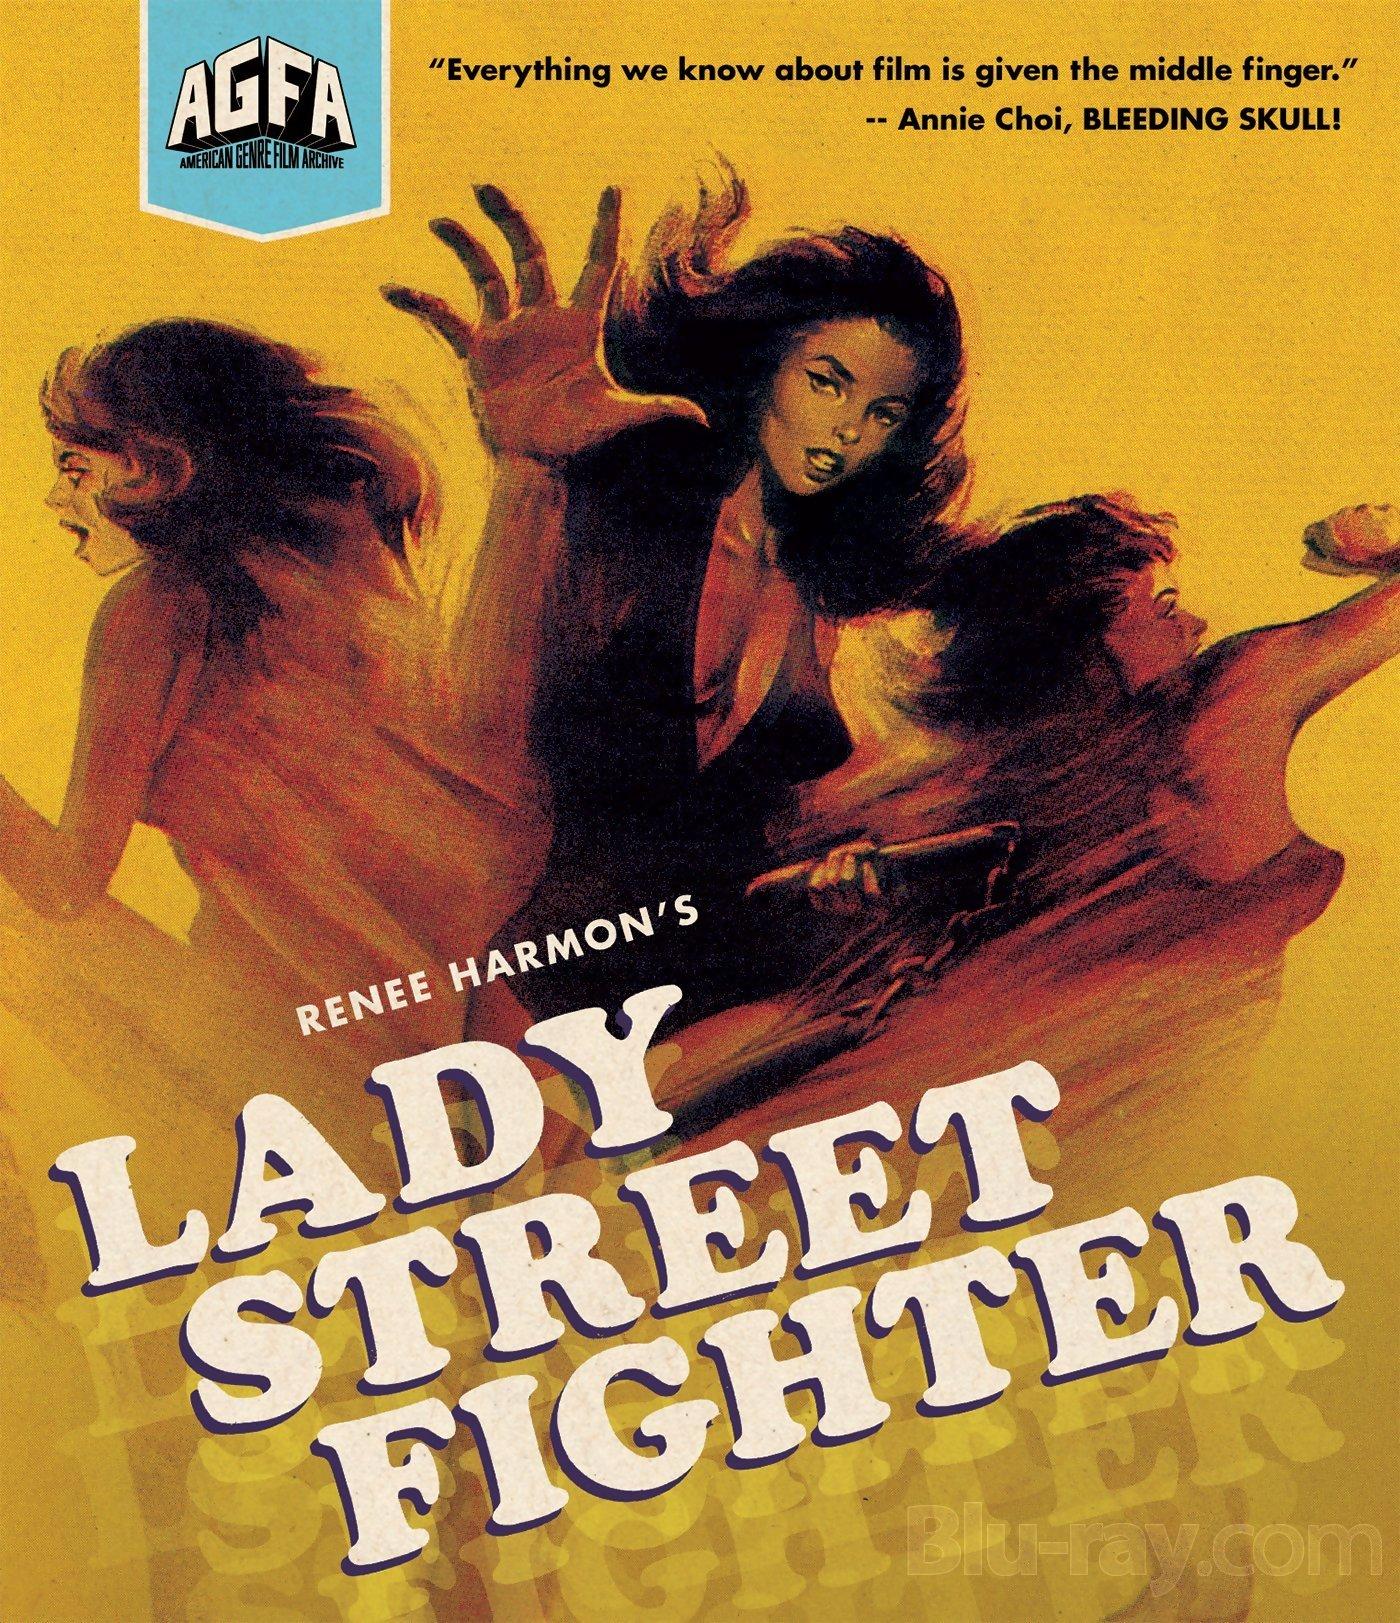 lady street fighter bluray